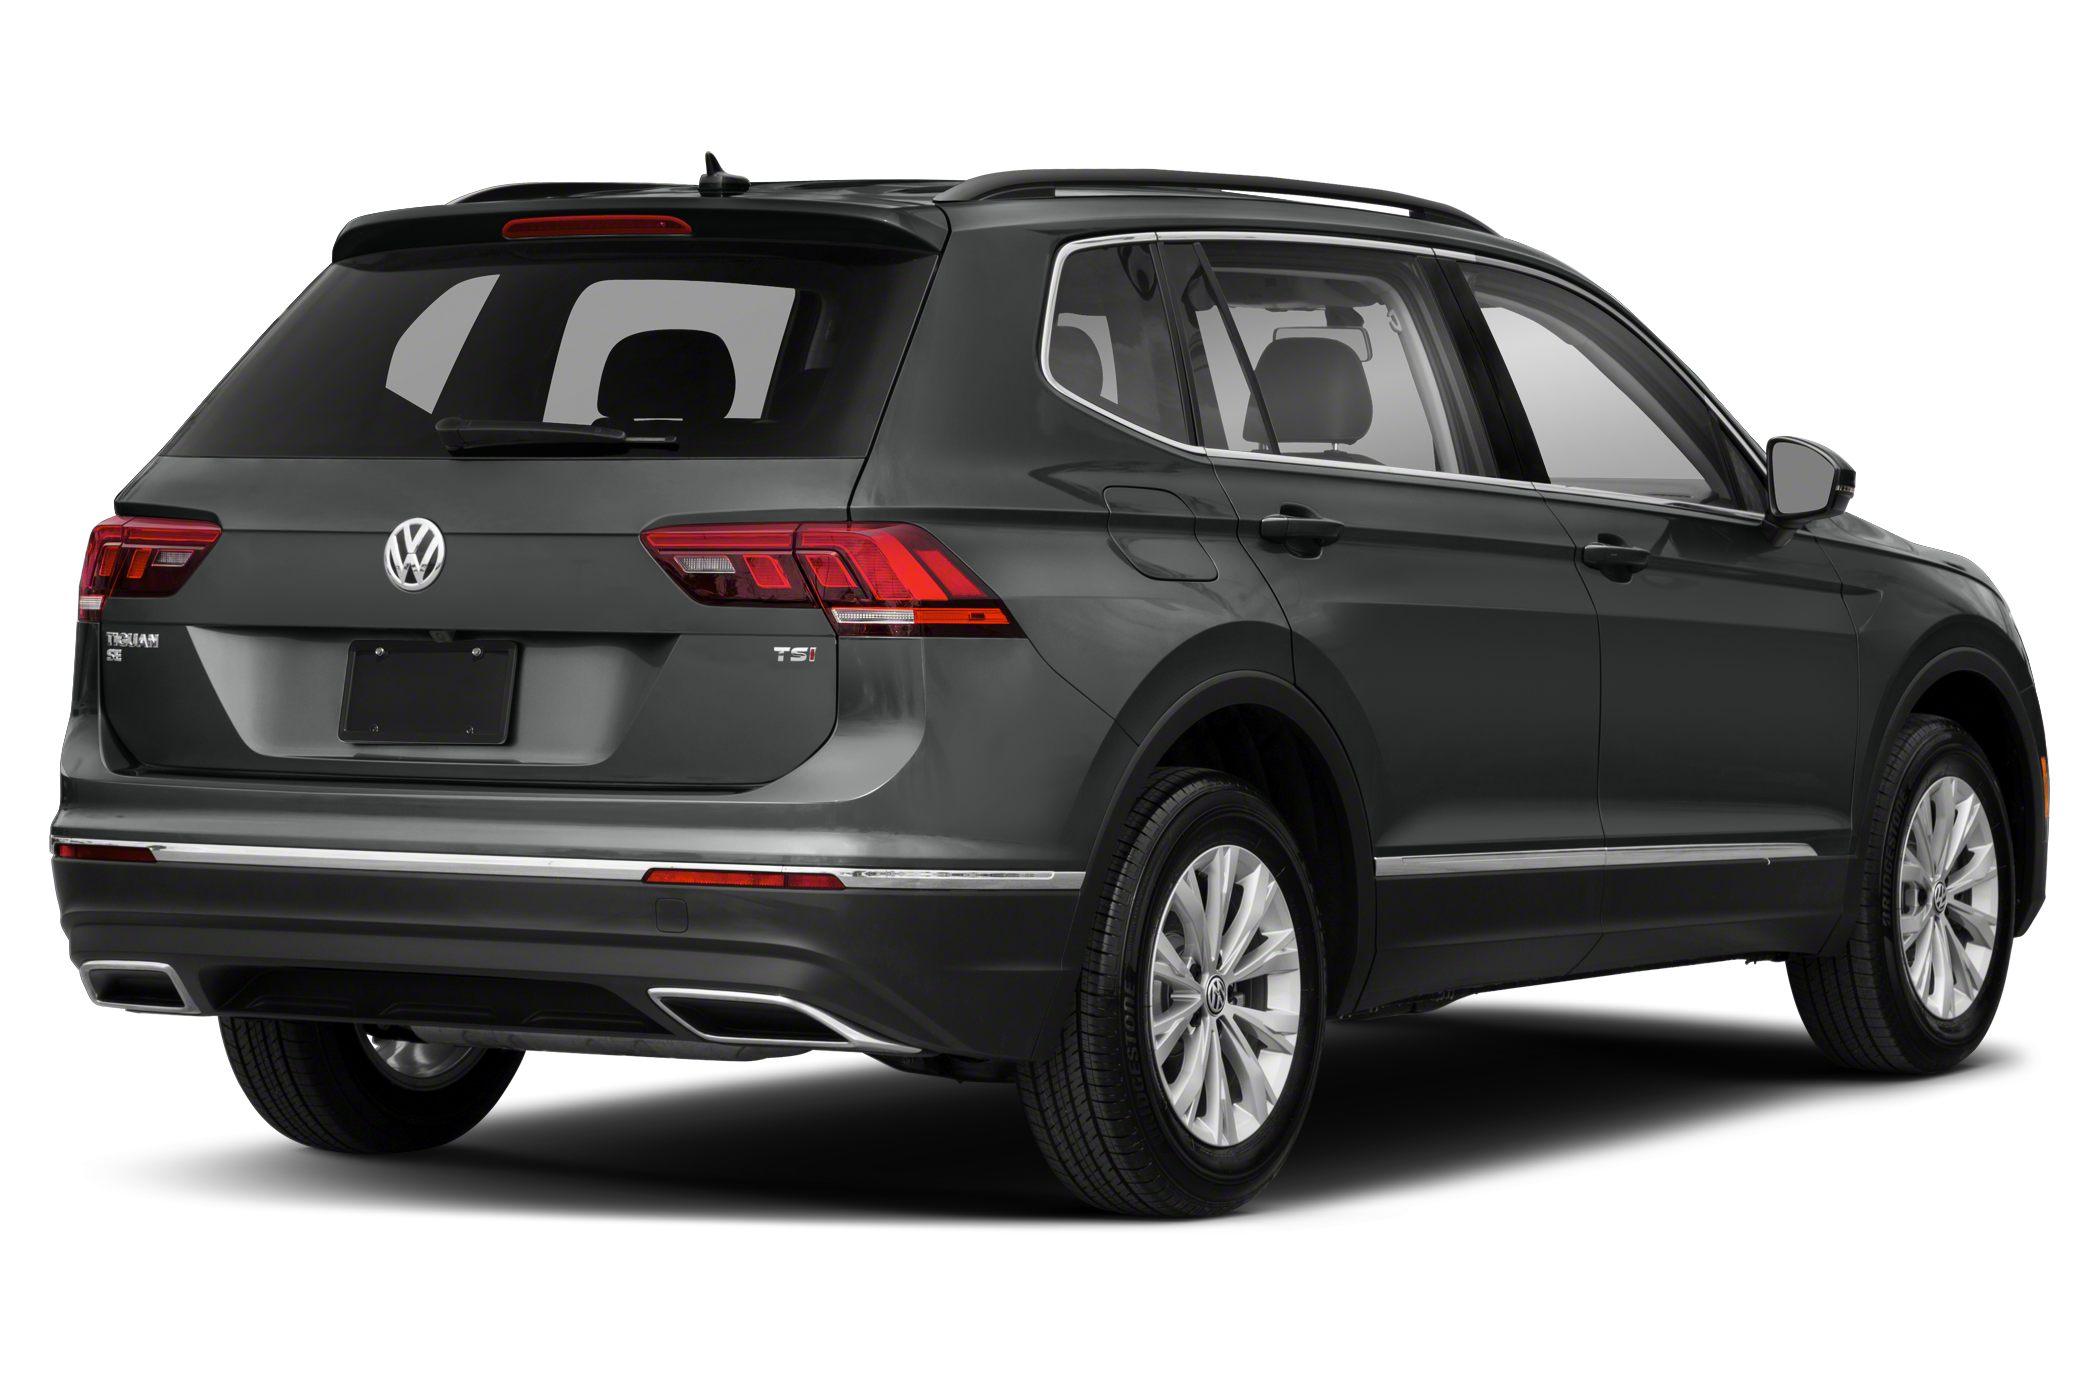 2021 Volkswagen Tiguan MPG, Price, Reviews & Photos ...